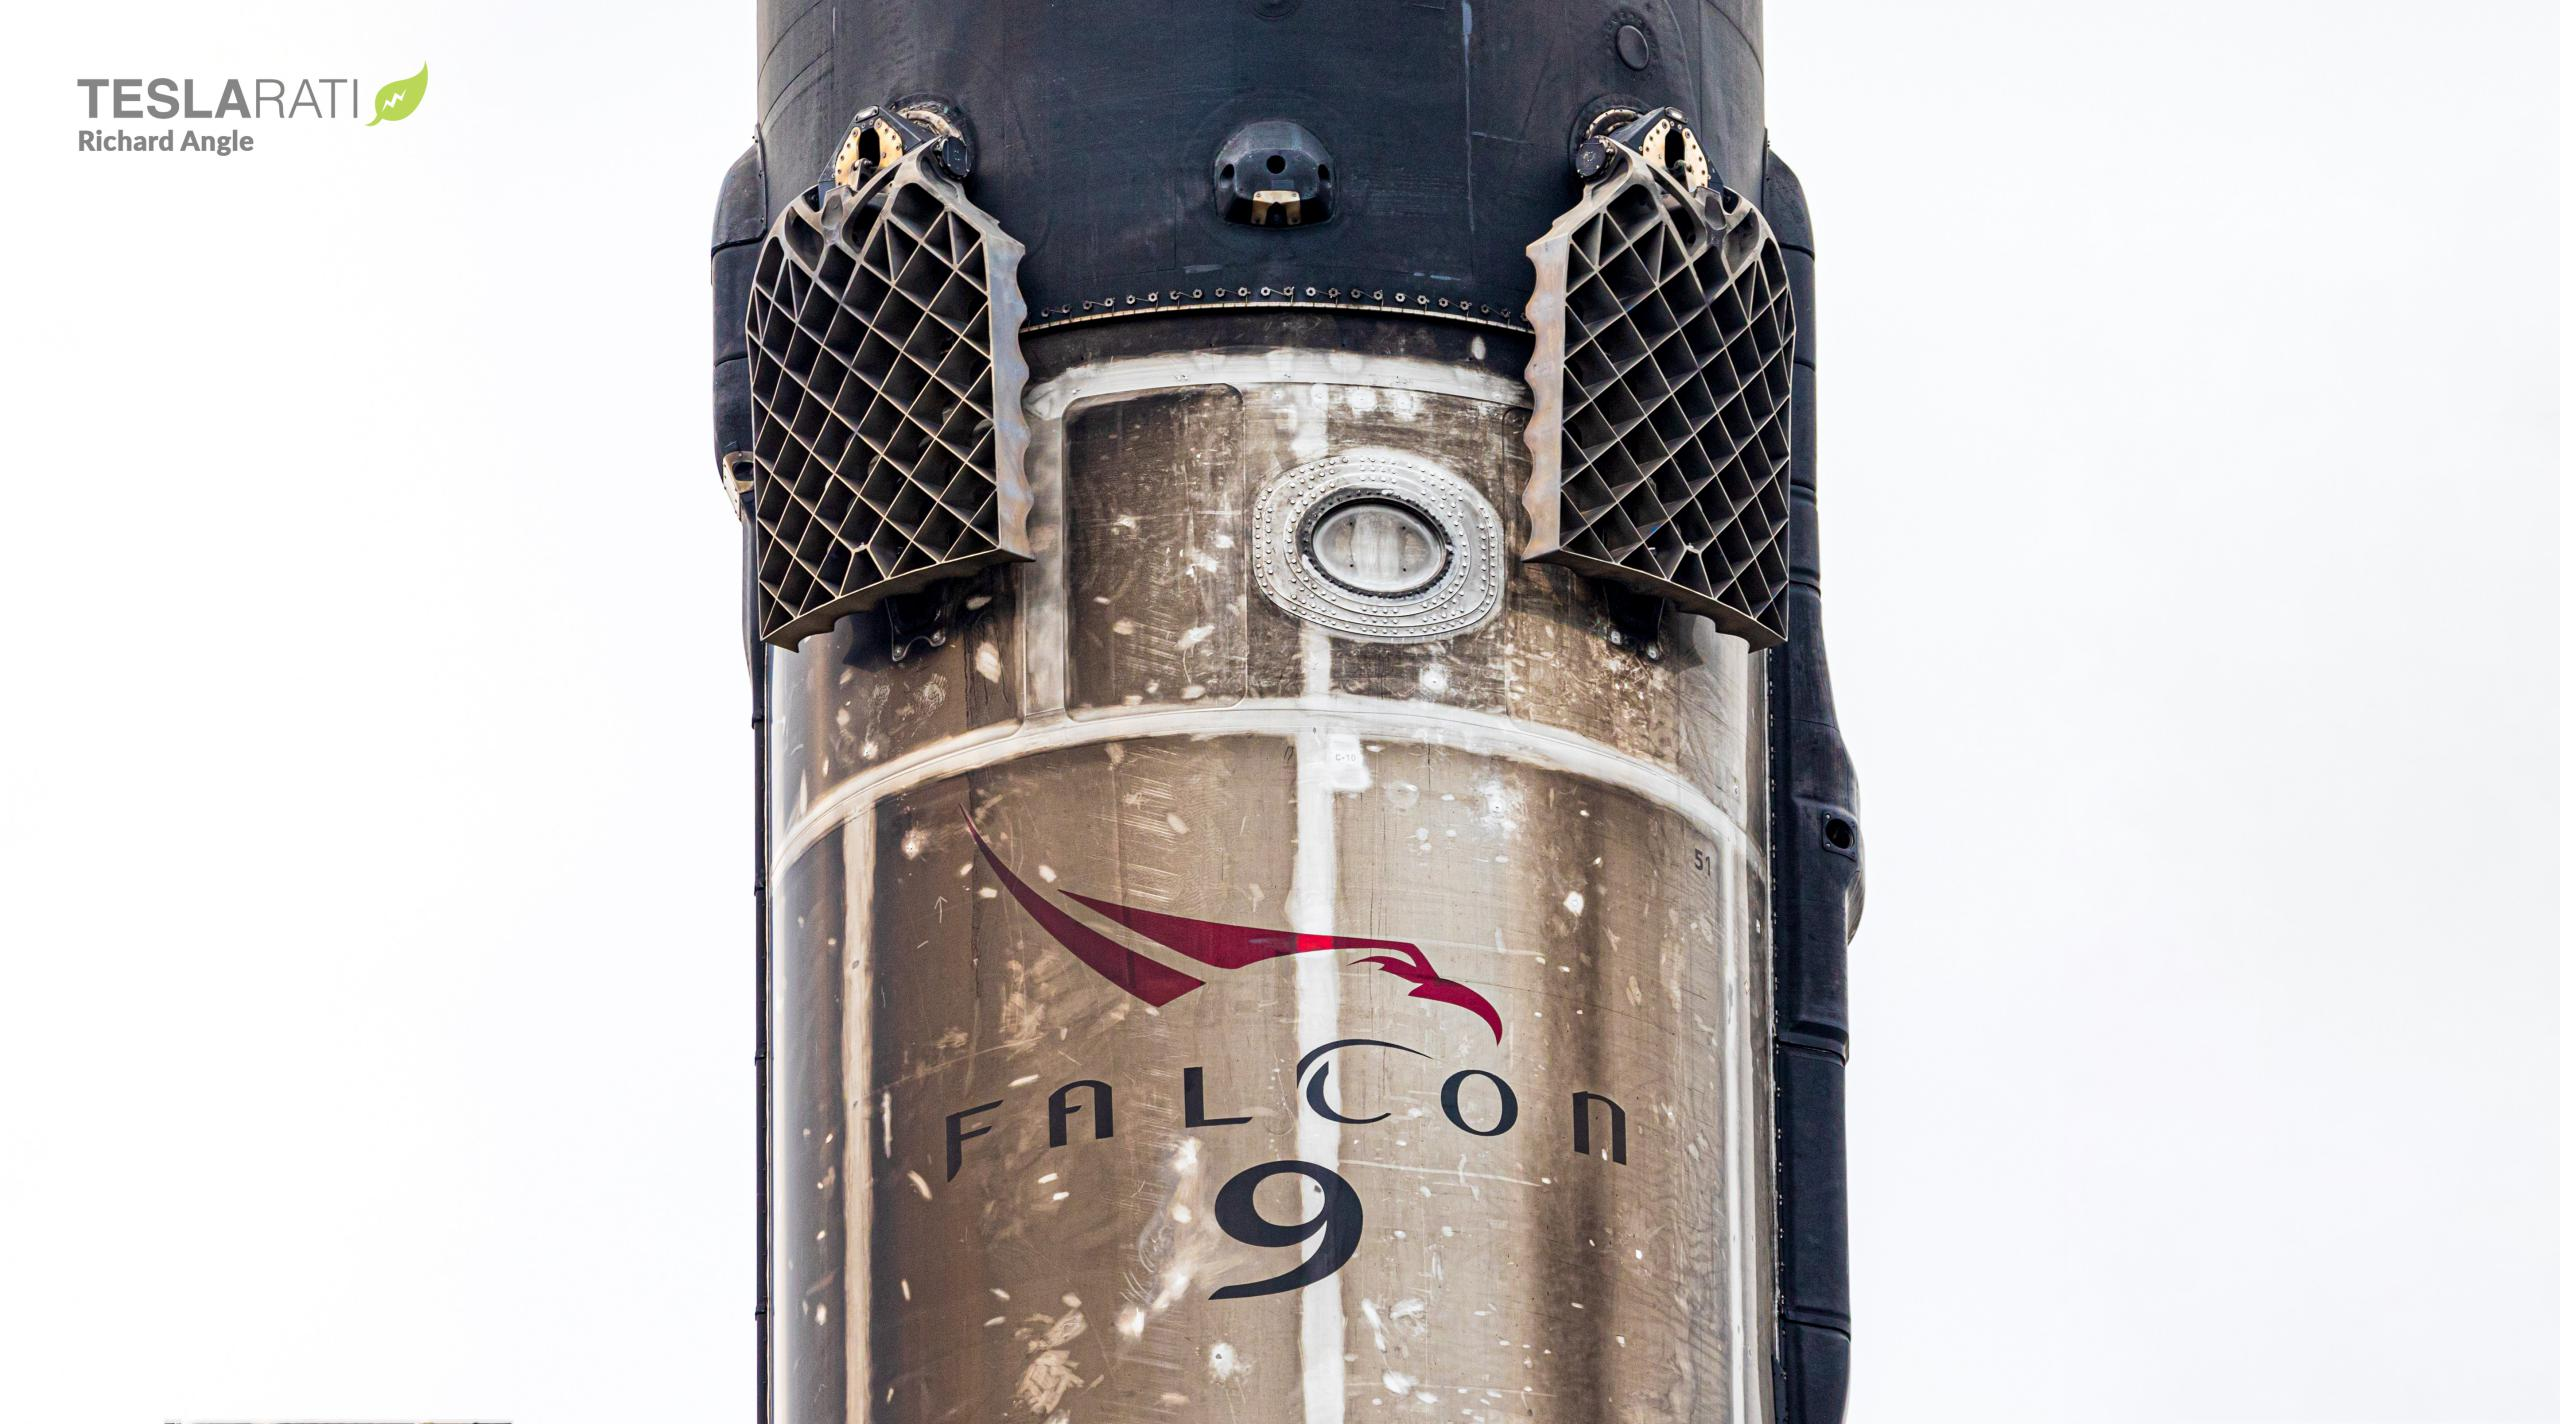 Starlink-27 Falcon 9 B1051 051221 (Richard Angle) port return 6 crop (c)